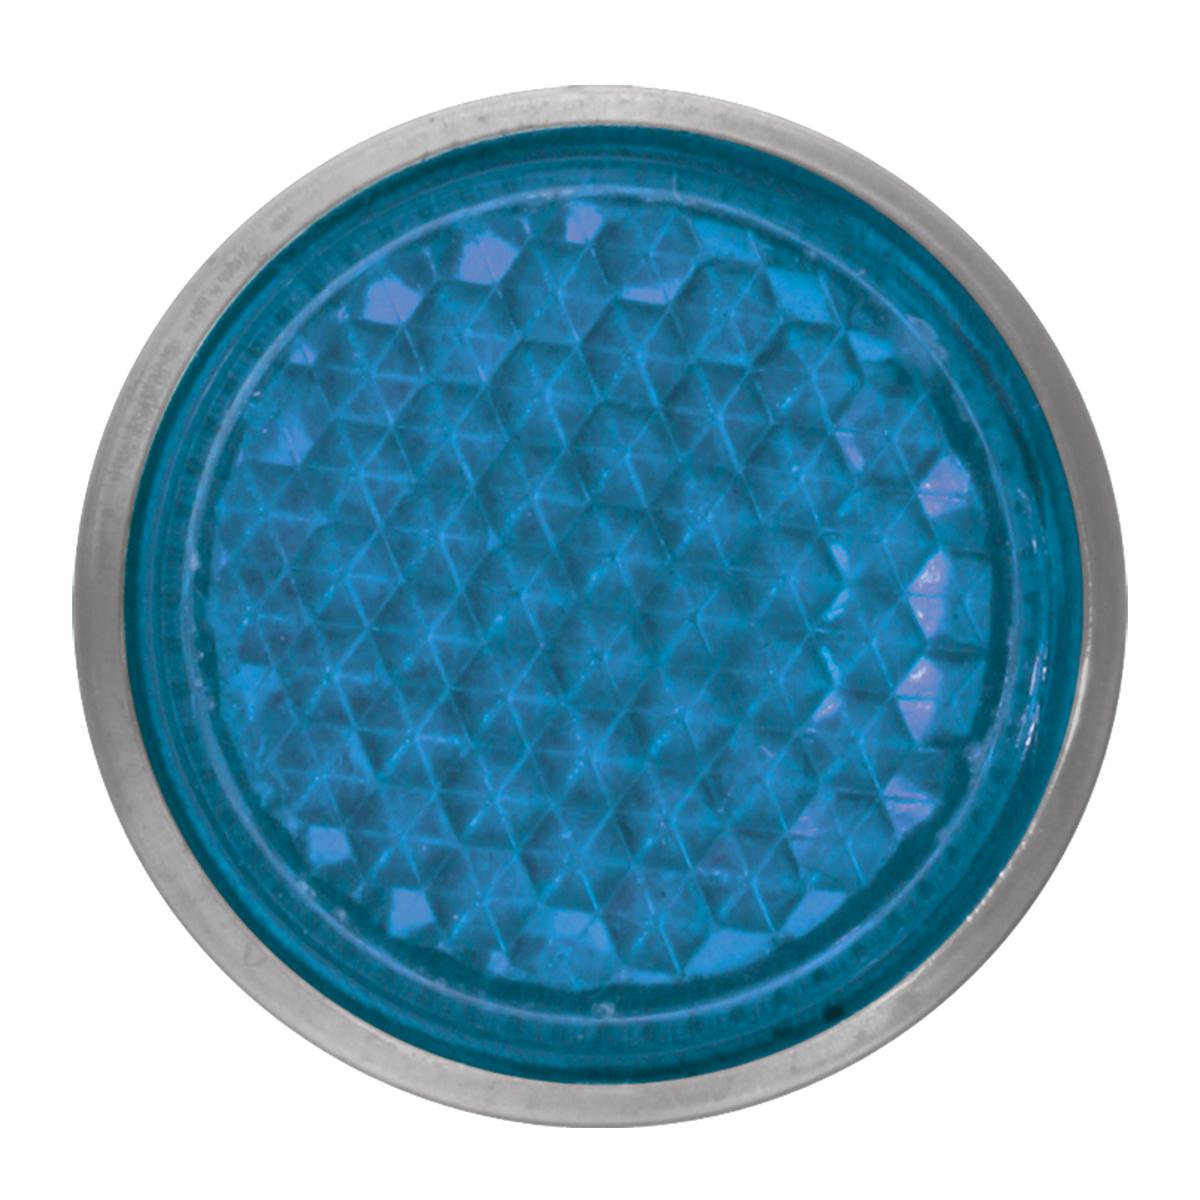 "Blue 5/8"" Round Screw Type Mini Reflector"